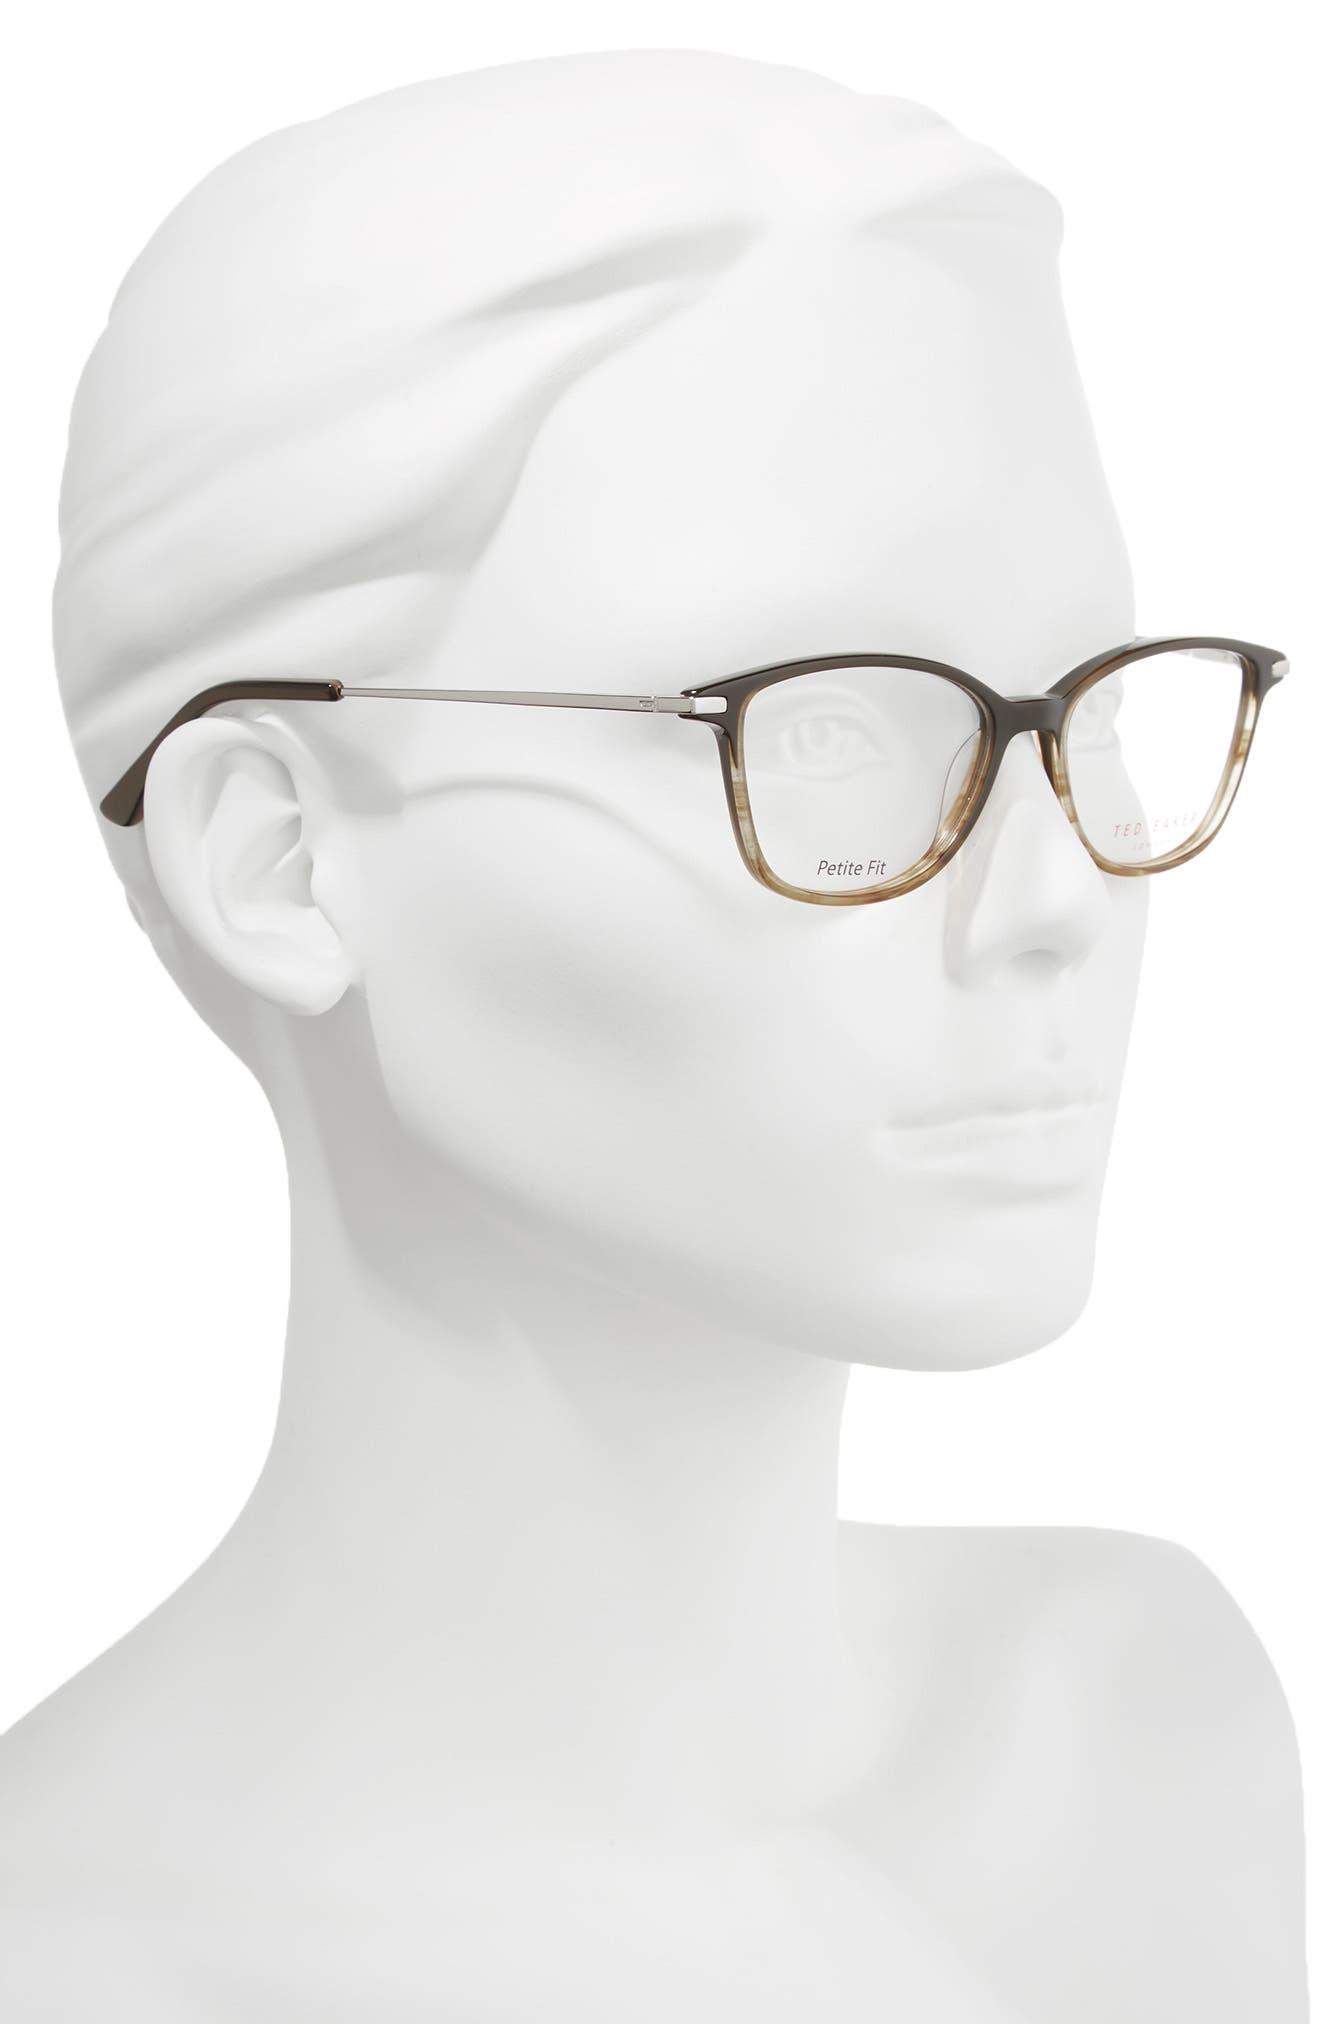 Petite Fit 50mm Optical Glasses,                             Alternate thumbnail 2, color,